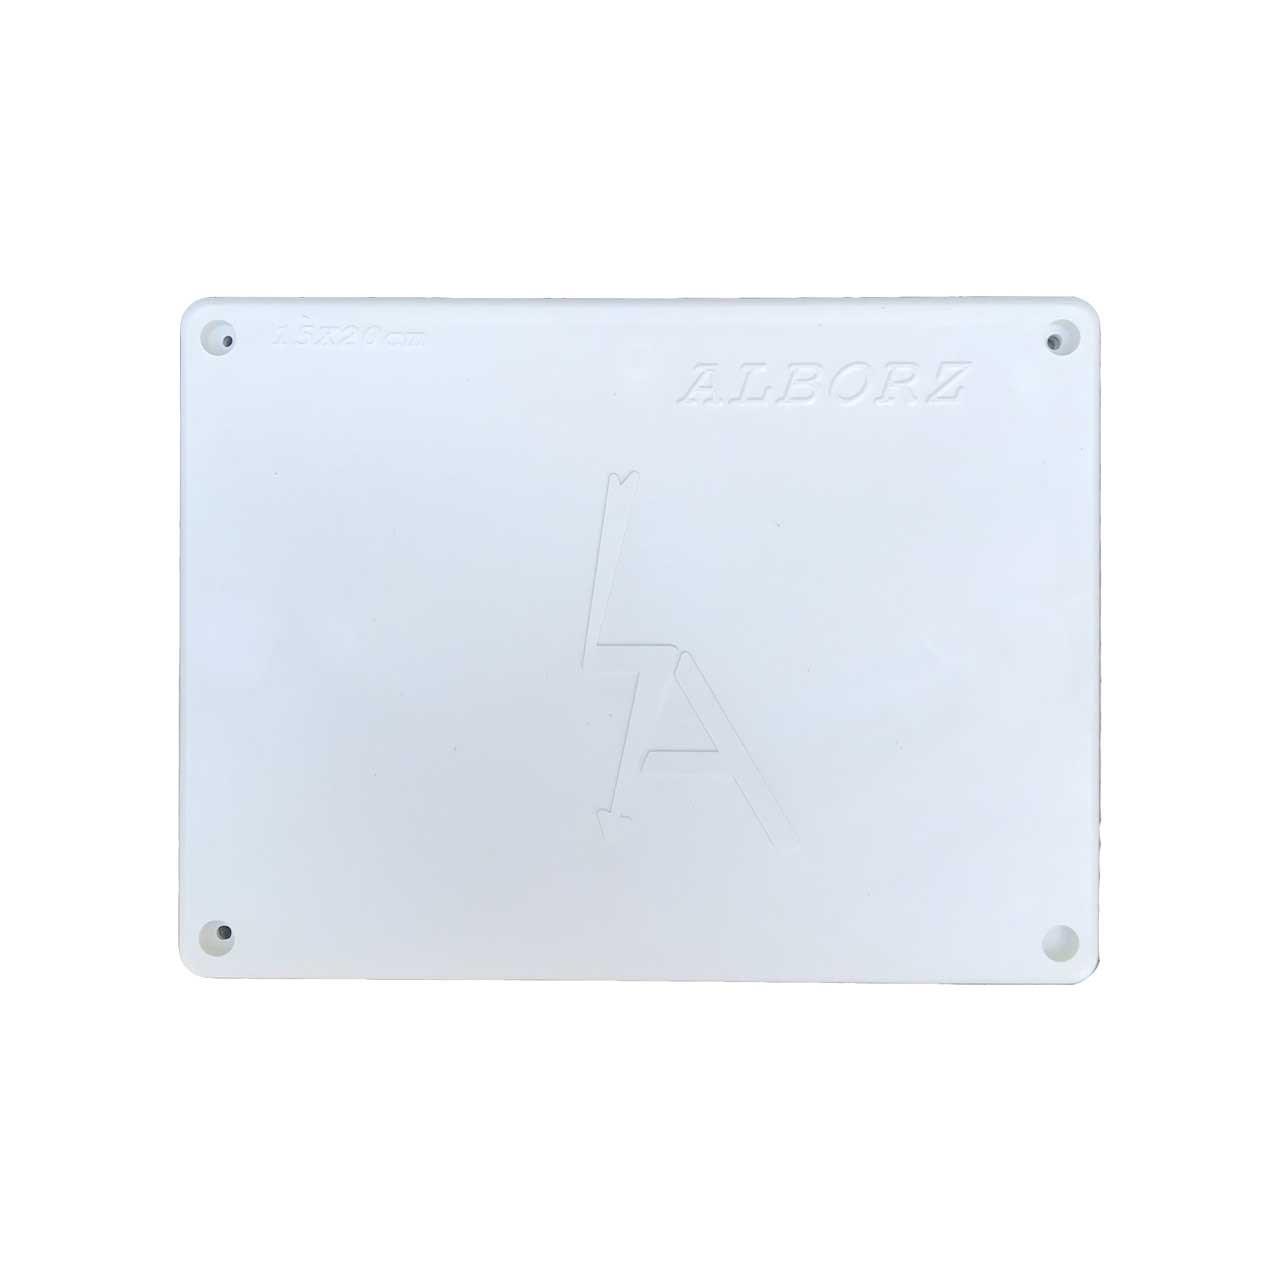 جعبه تقسیم برق البرز مدل 20x15